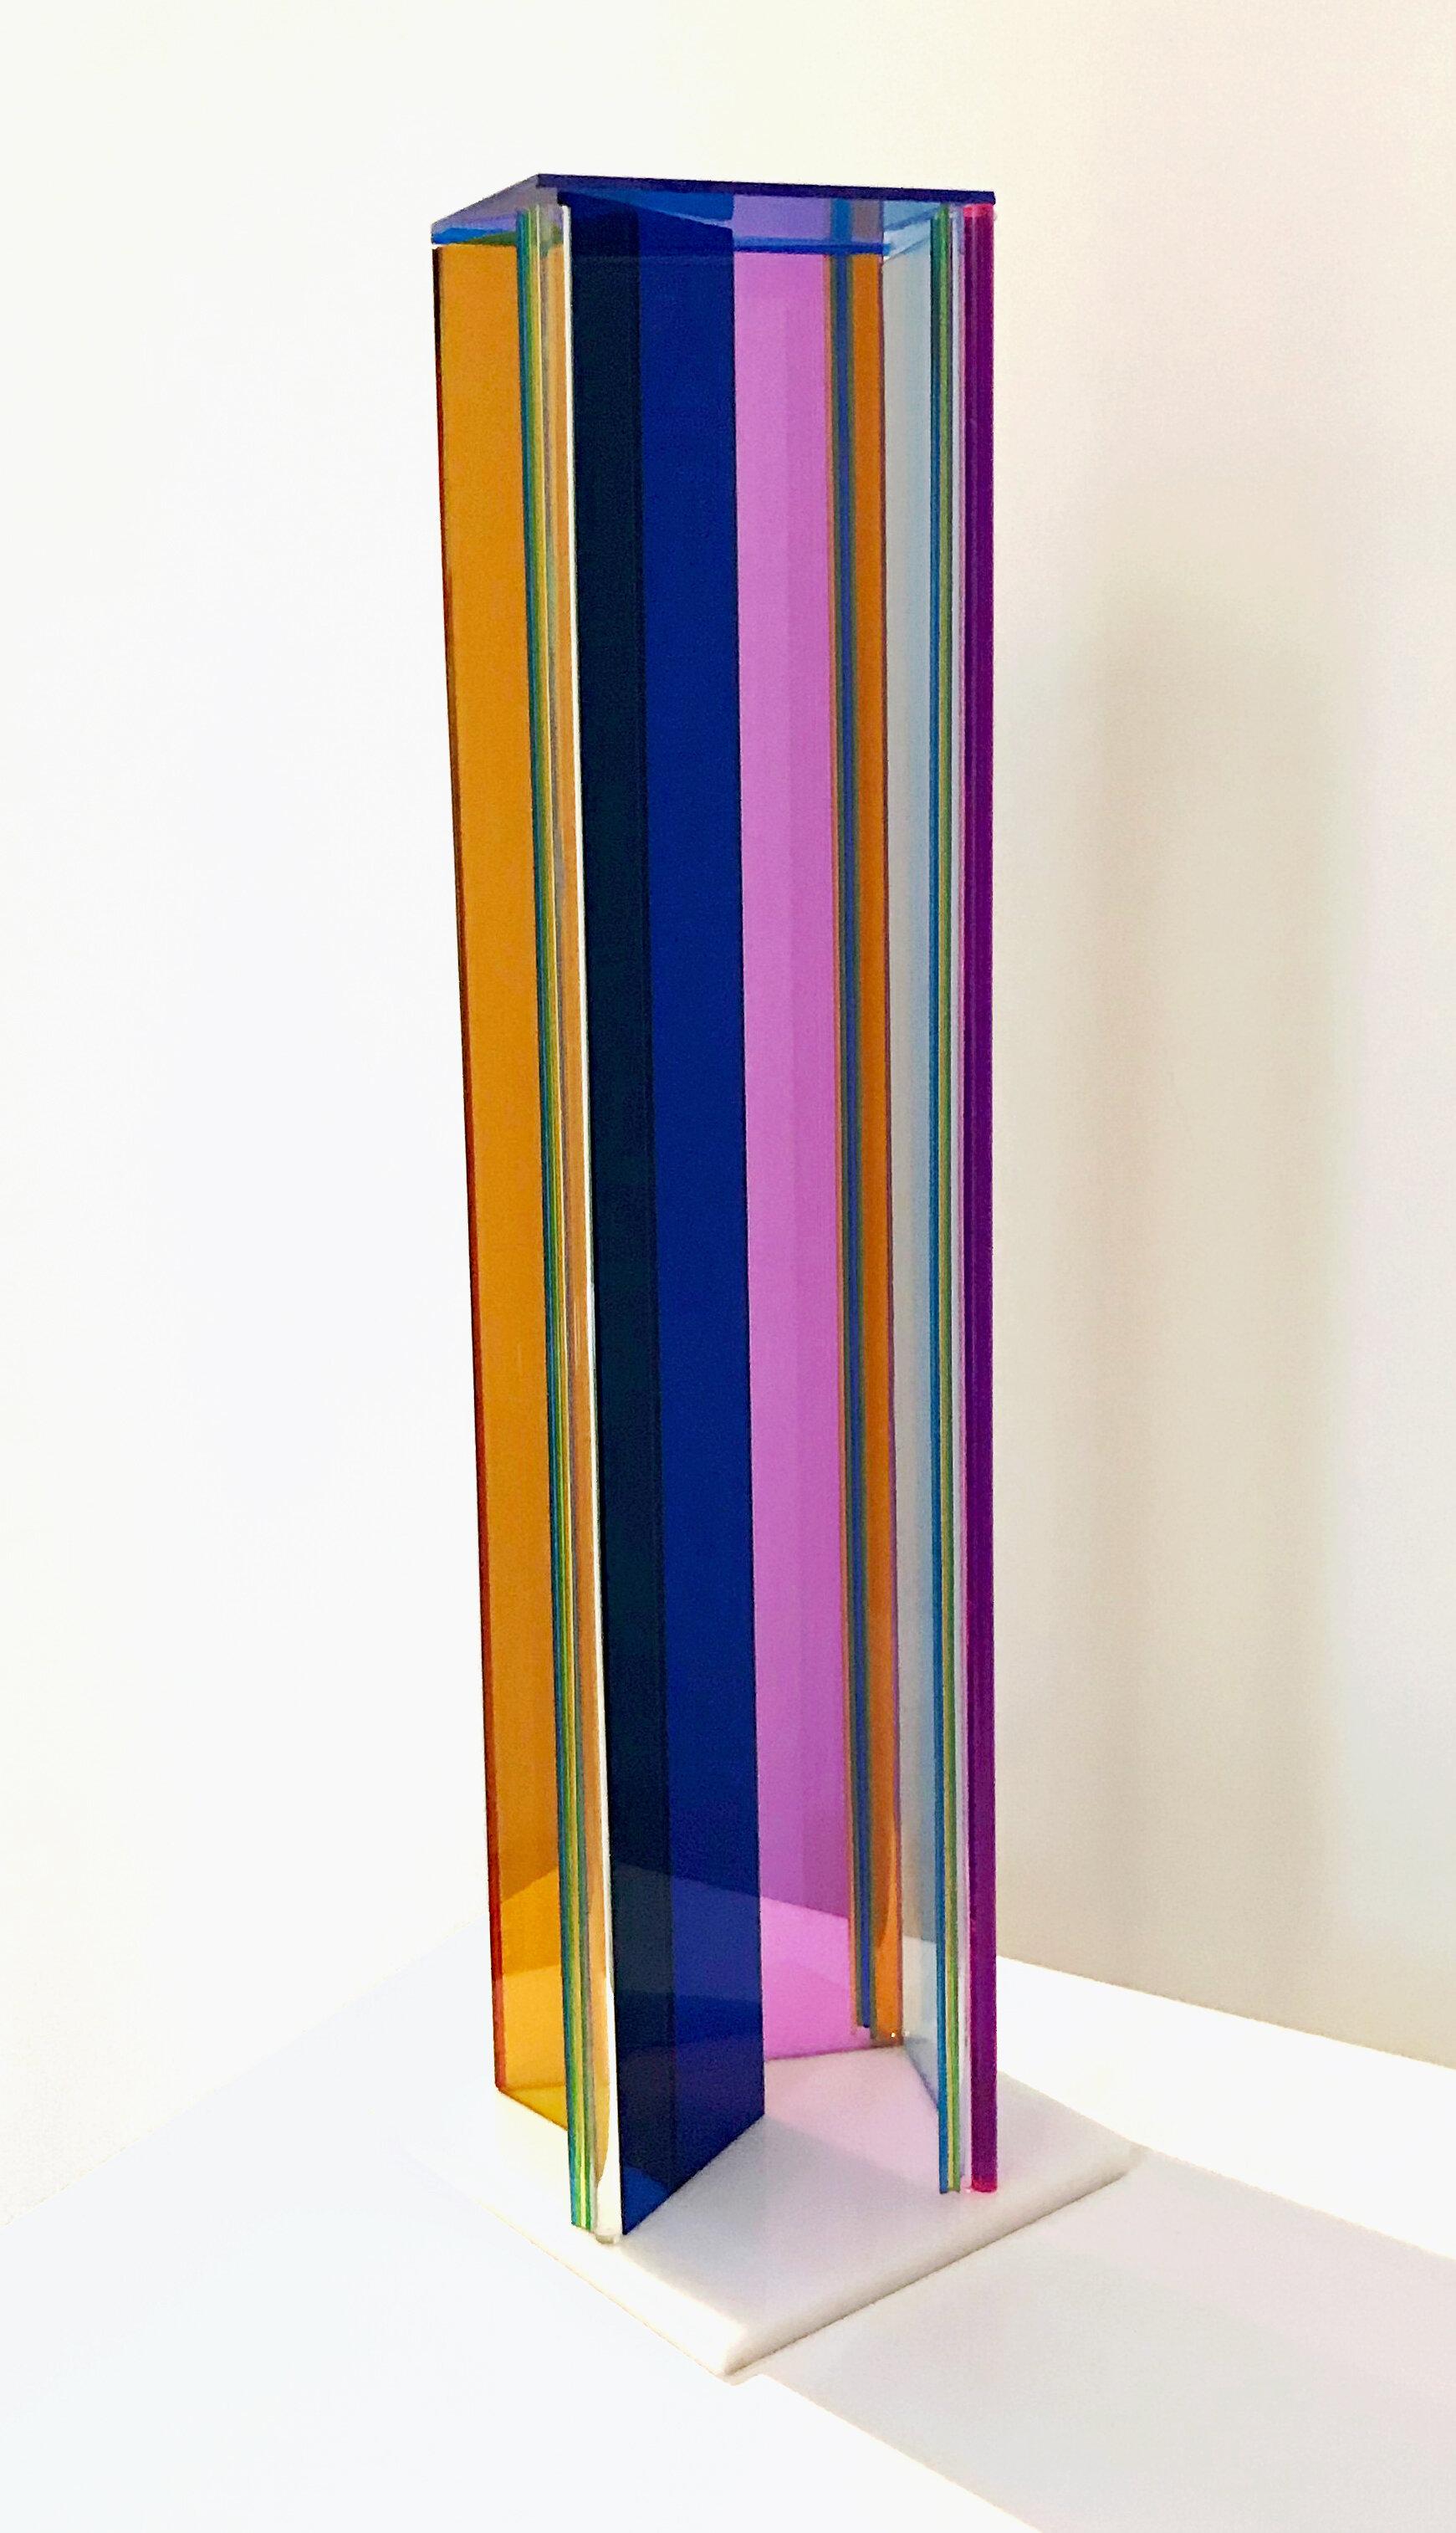 Neva Delihas Setlow-Small Column -5%22X5%22X18%22 Plexiglas Scupture.jpg